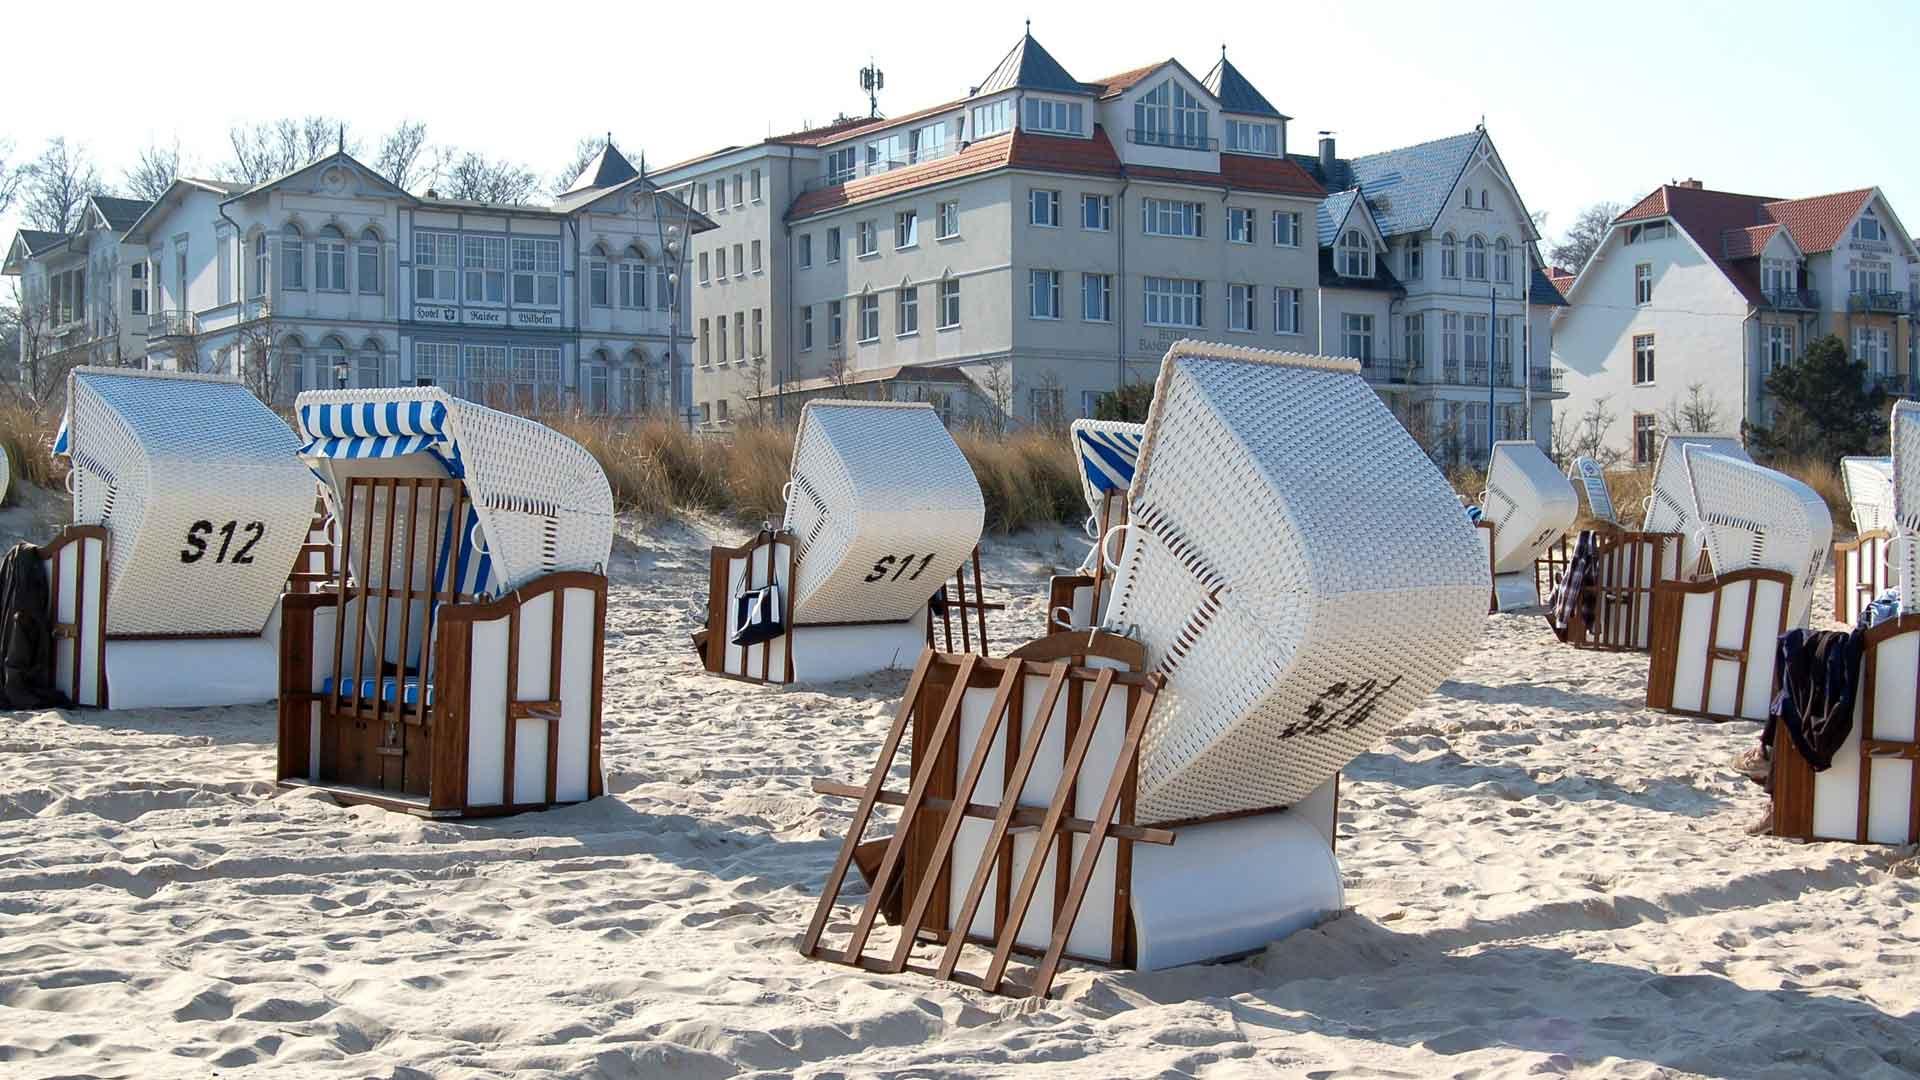 Strandmanden en badhuisarchitectuur in Bansin op Usedom.